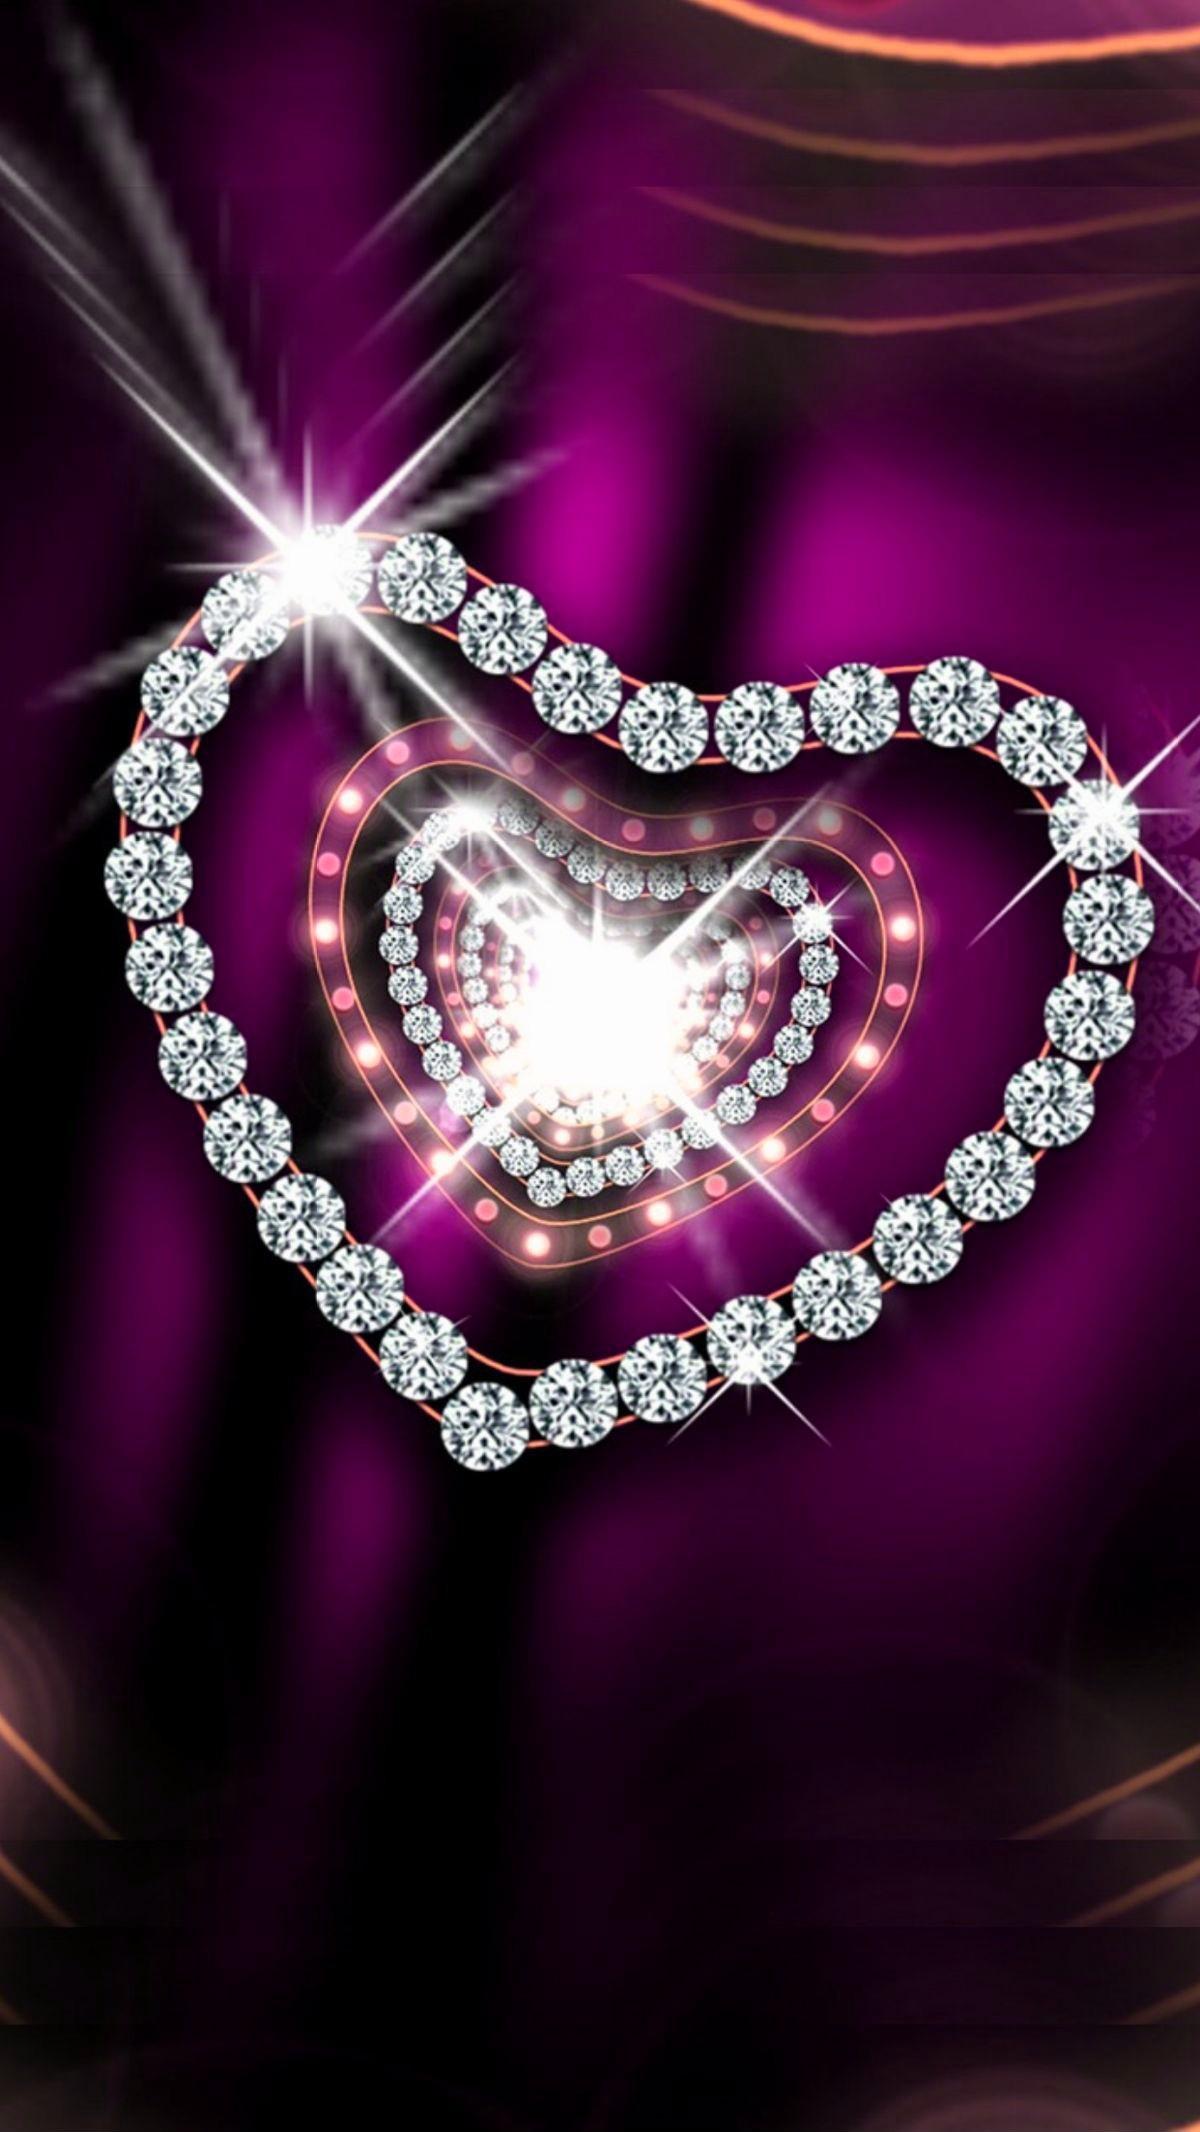 Argyle Iphone Wallpaper Diamonds Wallpapers 57 Images